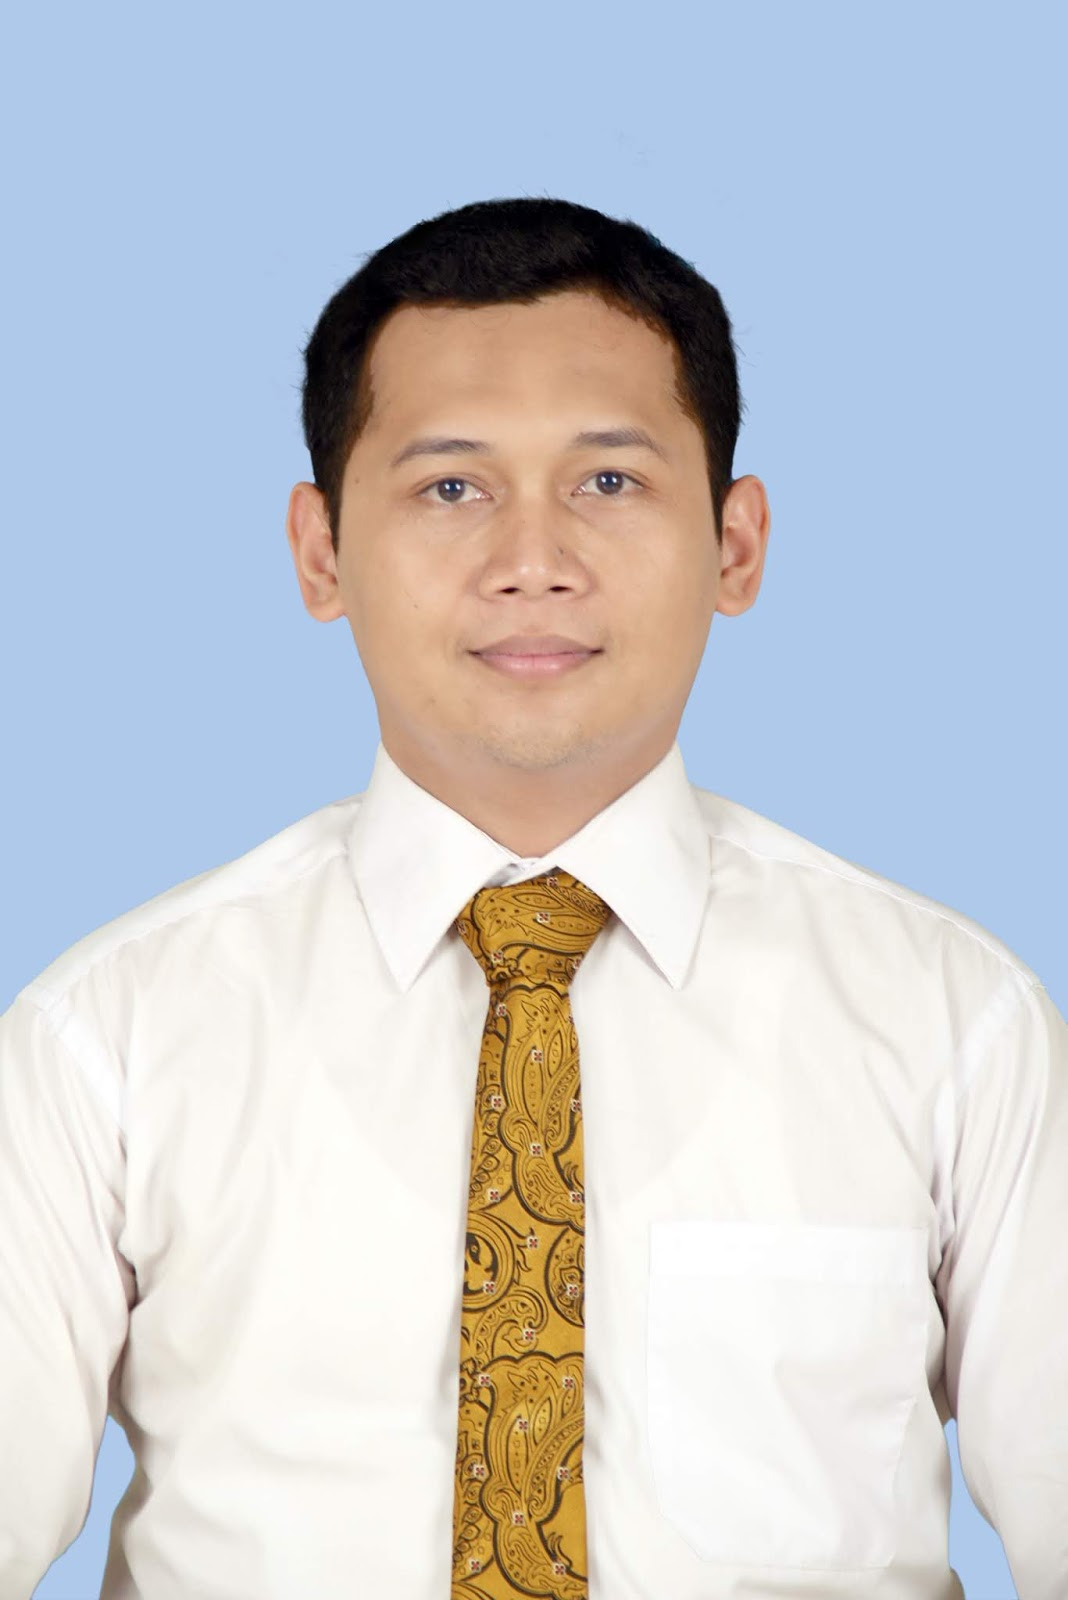 Profil Singkat Binar Kurnia Prahani - MEDIA ILMU